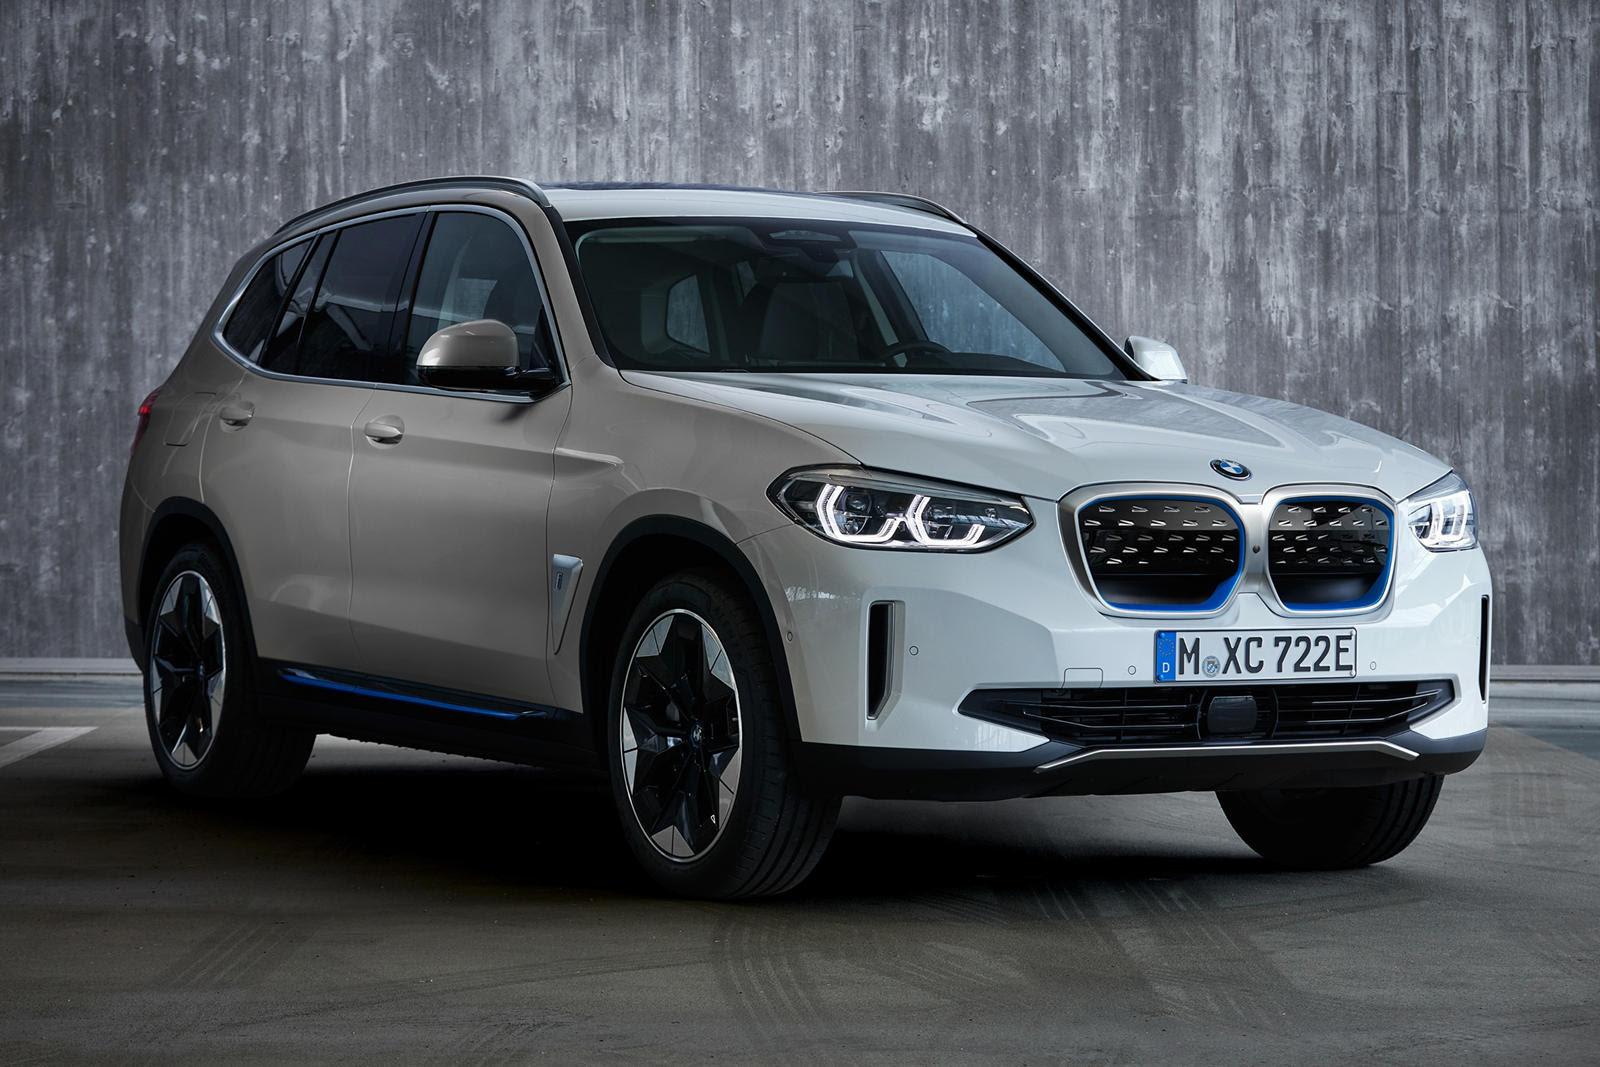 2021 bmw ix3 unveiled with 285 miles of range  carbuzz